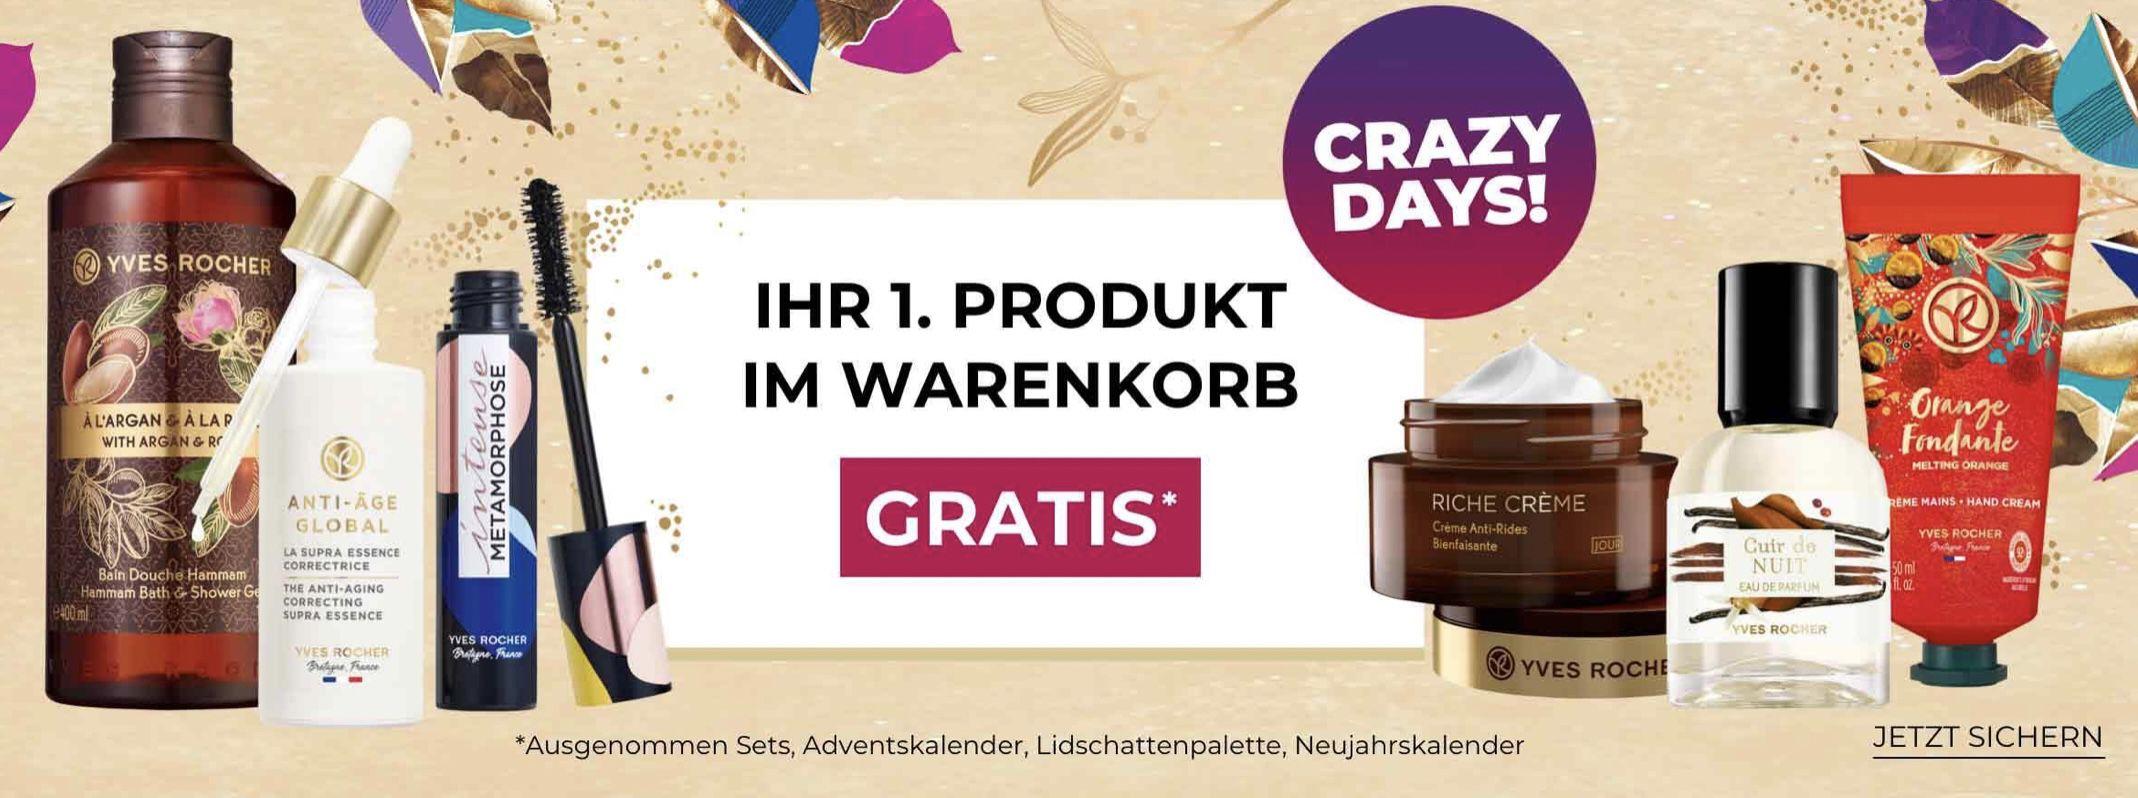 Yves Rocher Crazy Deals: 1. Artikel Gratis ab 10€ MBW + VSK frei ab 20€